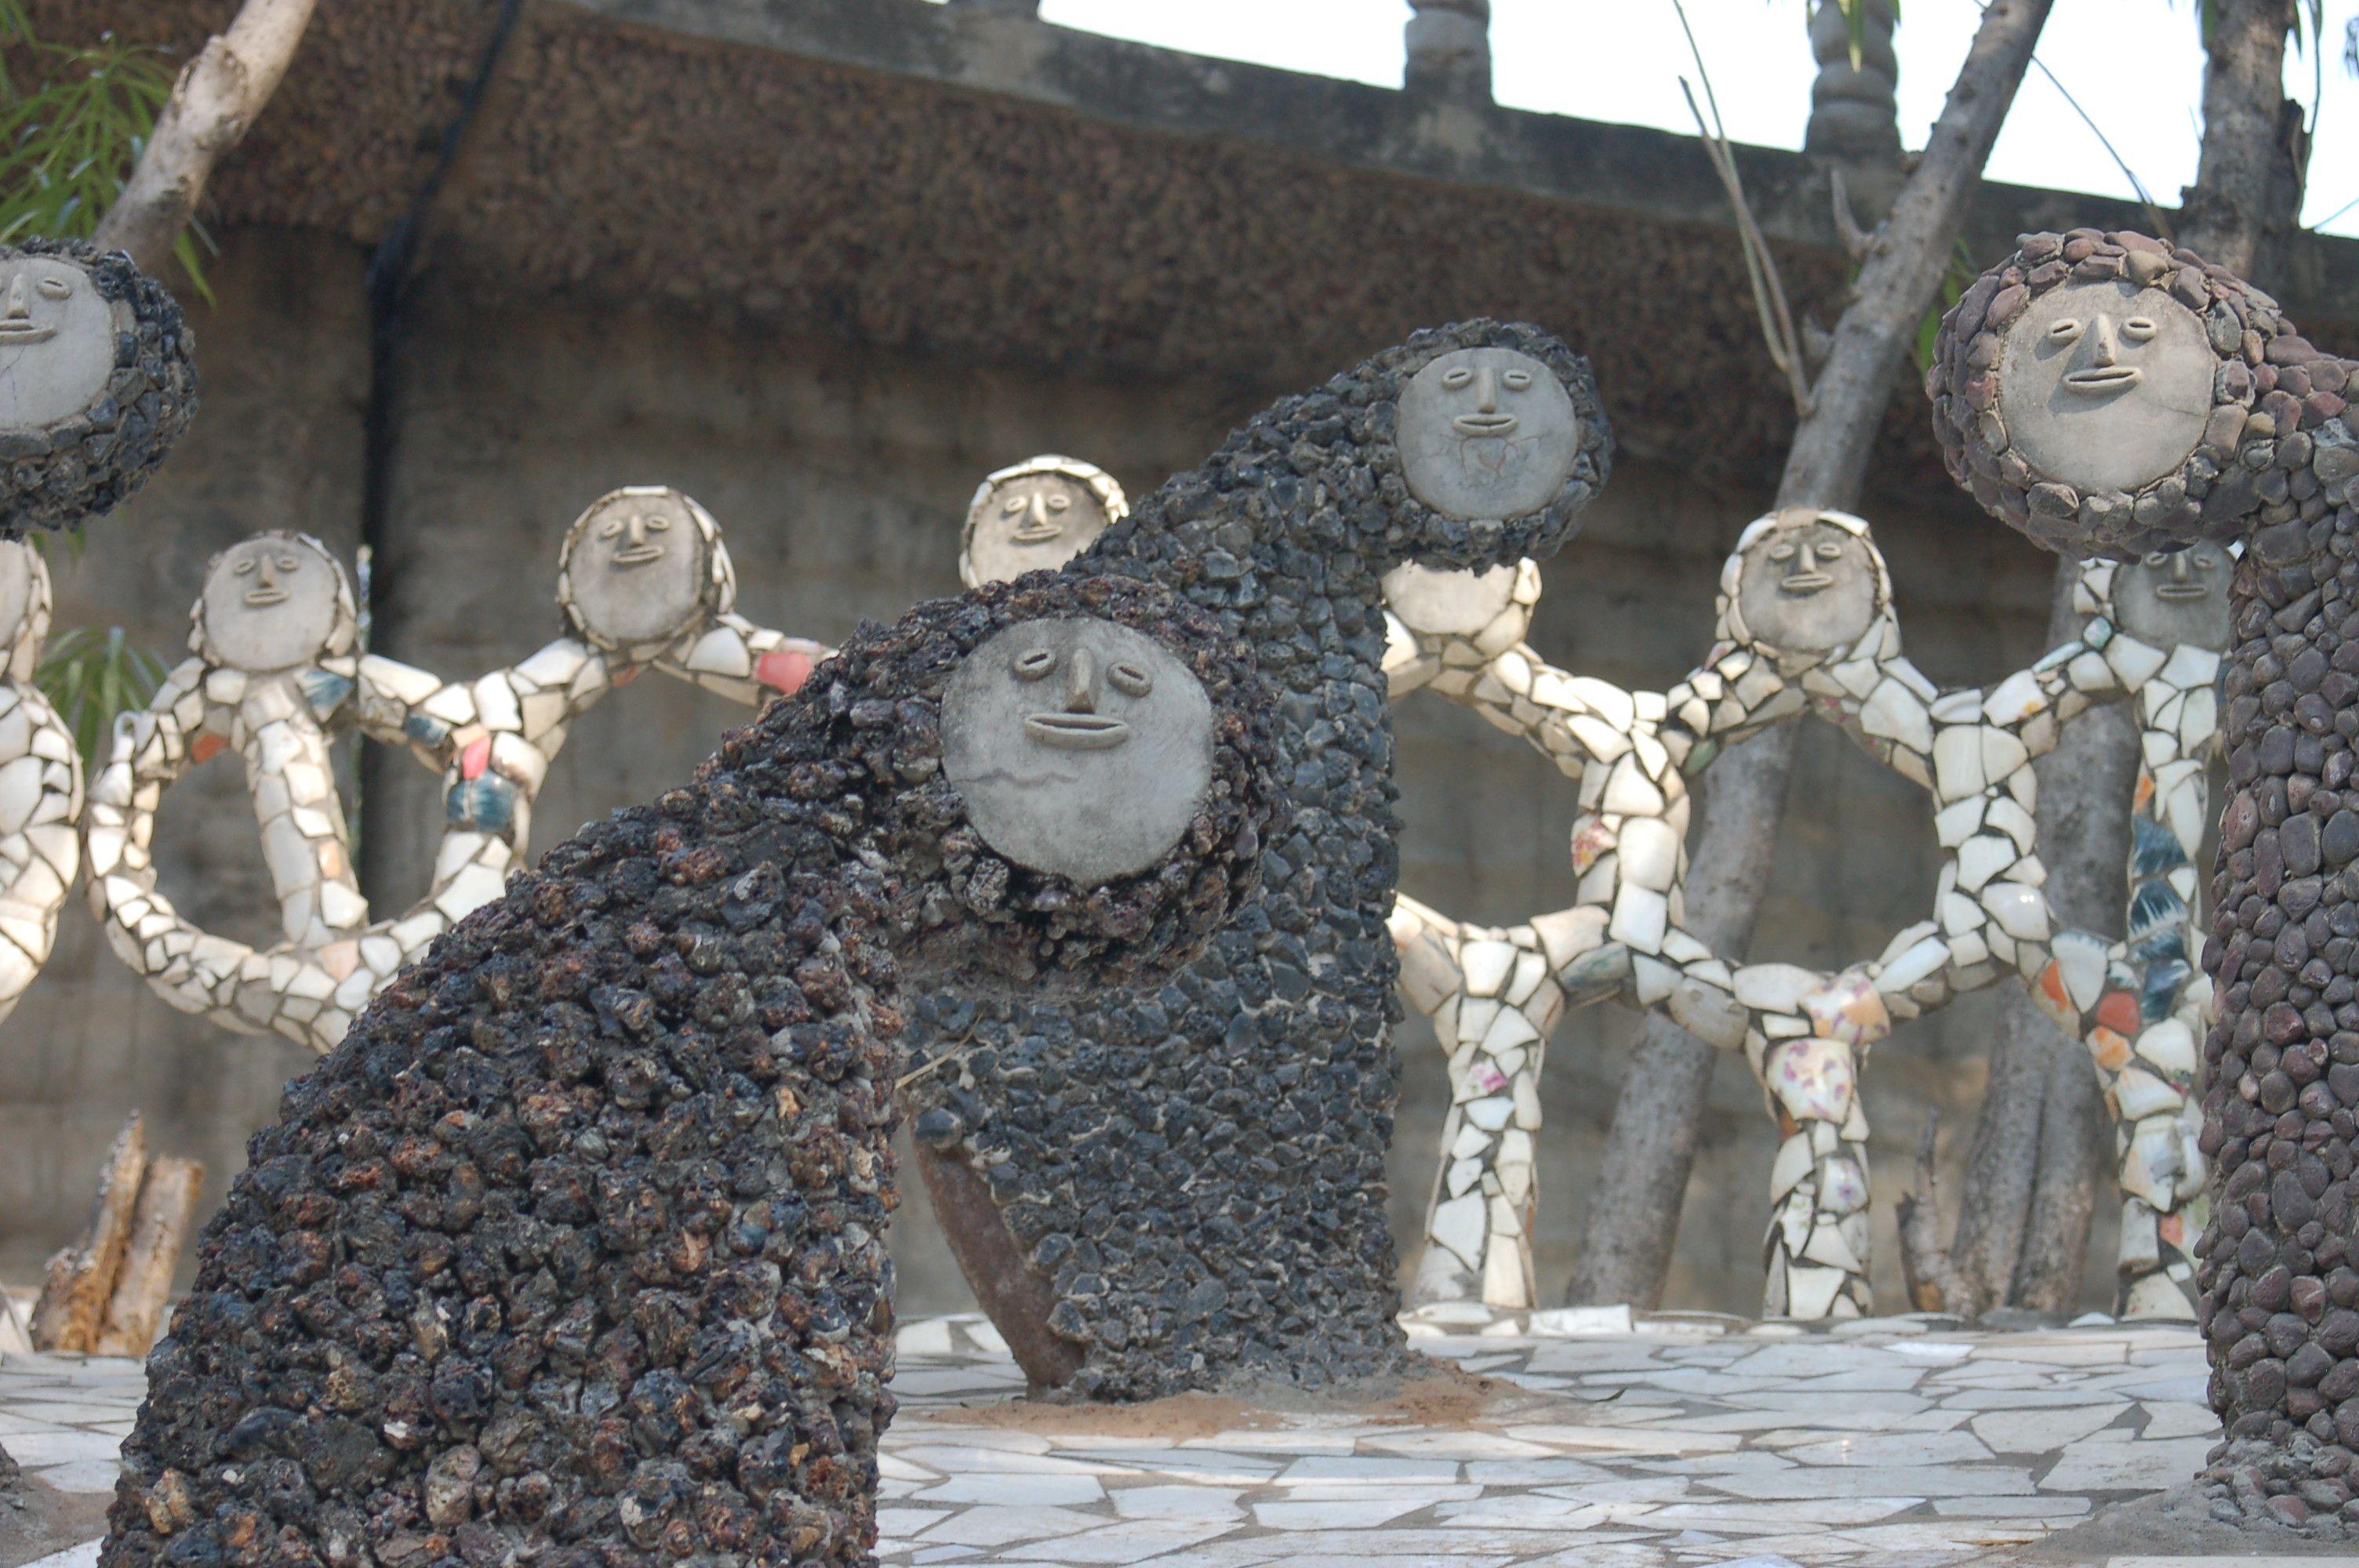 Public Art Public Art Rock Garden Garden Statues